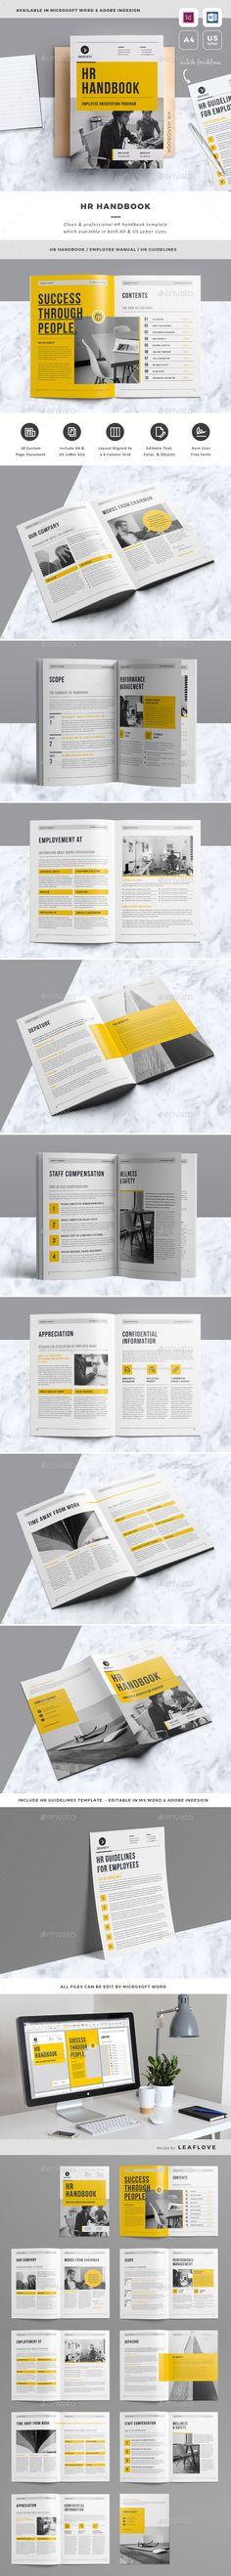 HR Handbook - Informational #Brochures Download here: https://graphicriver.net/item/hr-handbook/19461339?ref=alena994